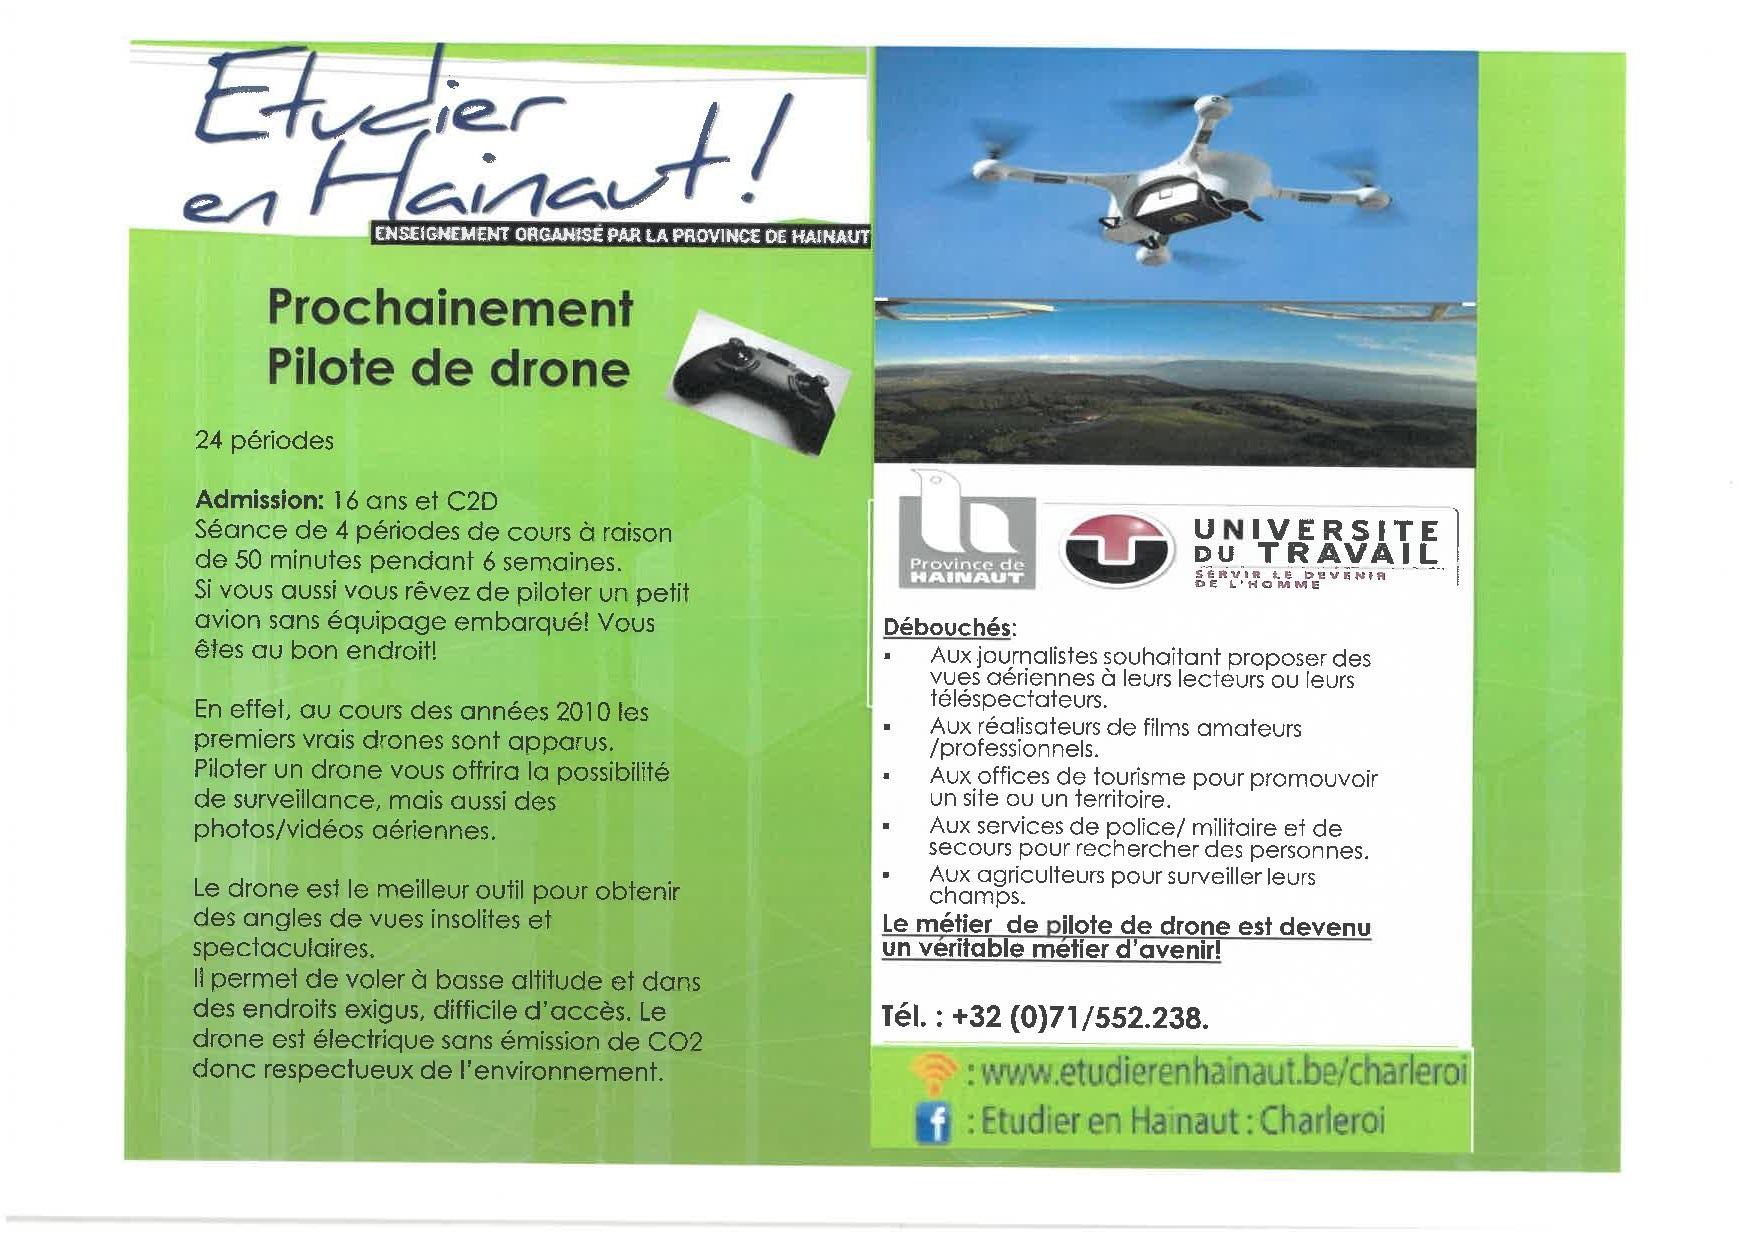 Devenir pilote de drone!